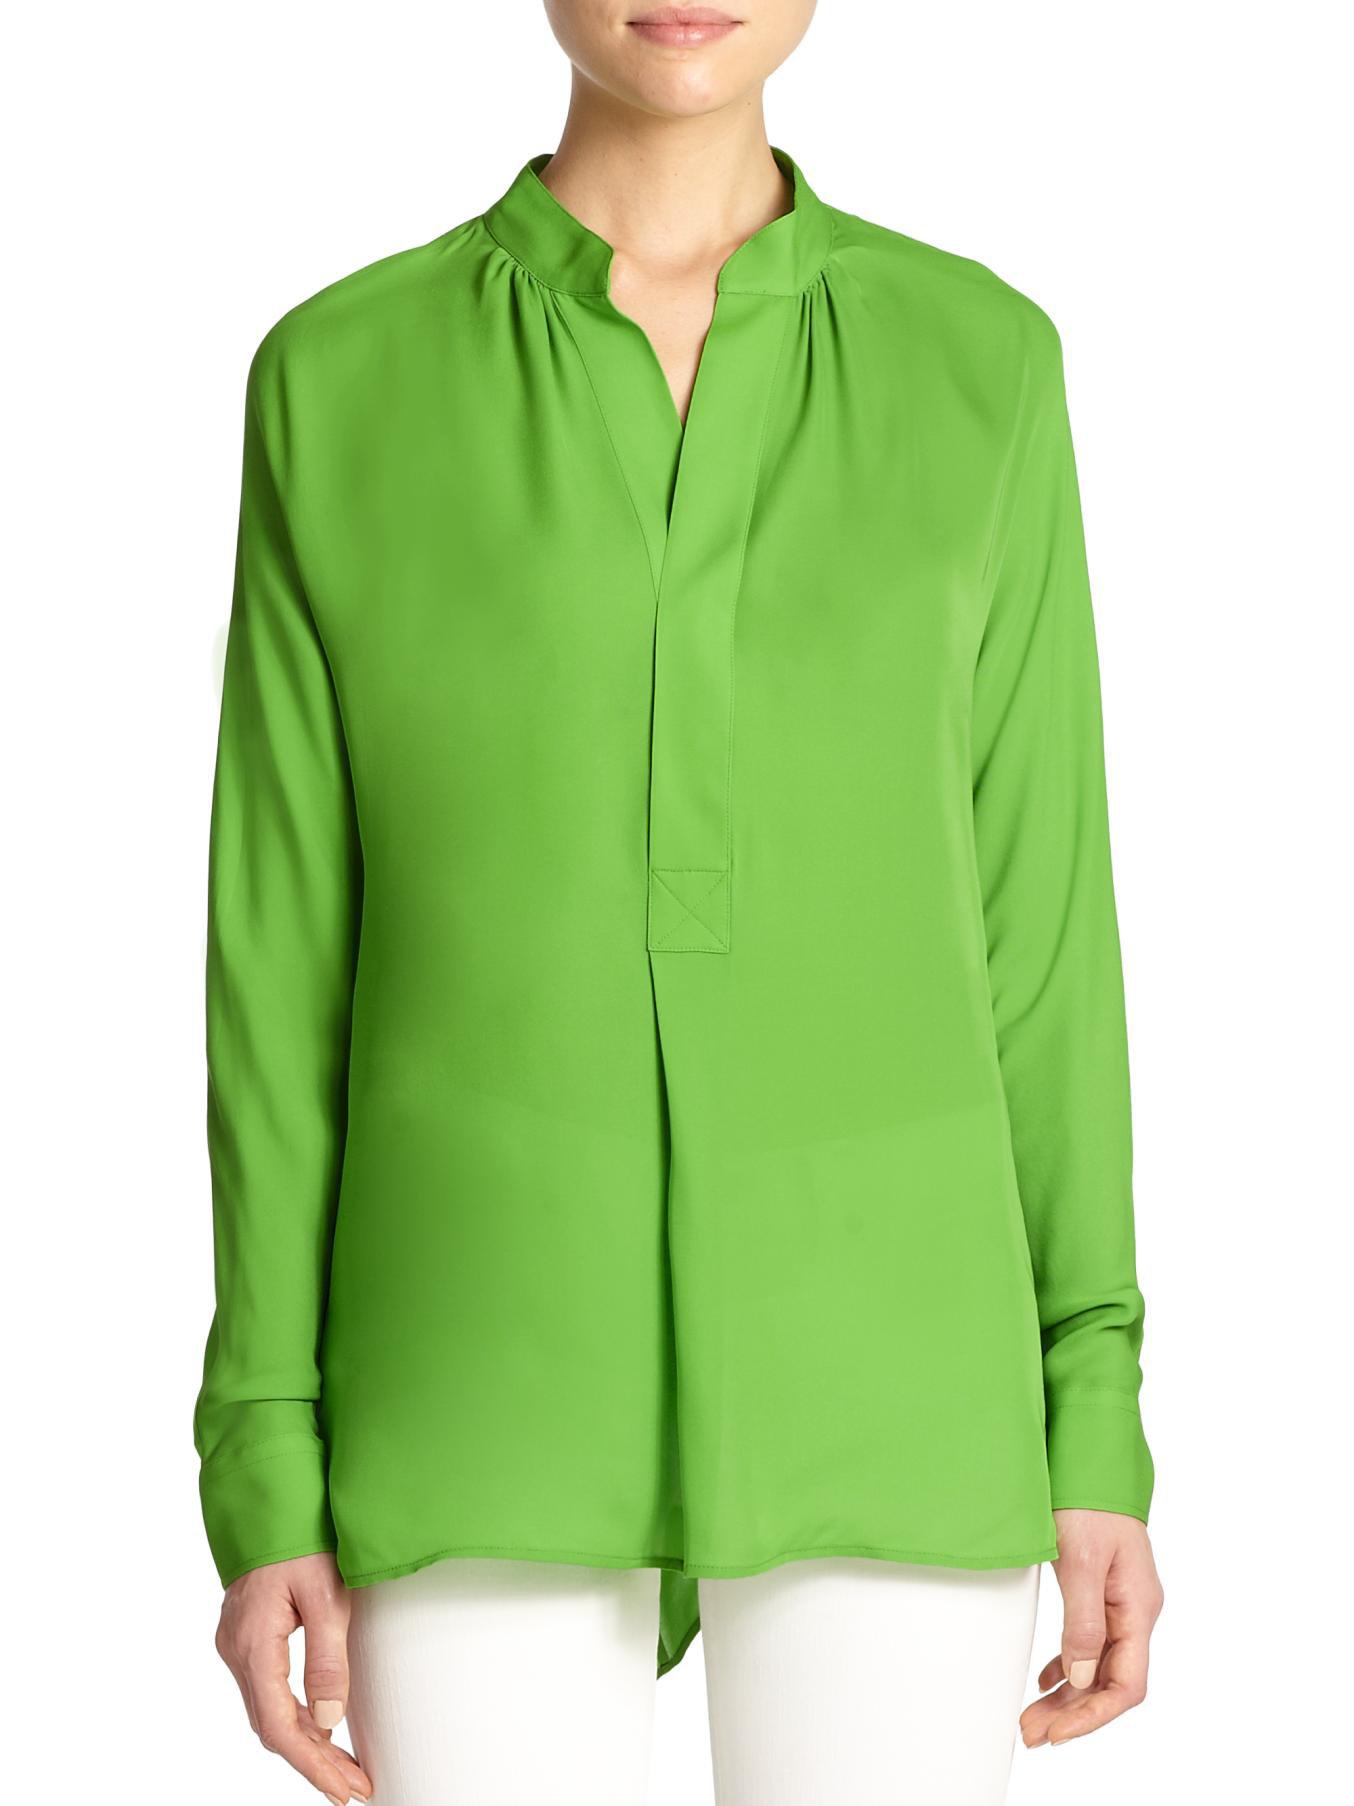 69f5ad1e265658 Lyst - Polo Ralph Lauren Silk Blouse in Green